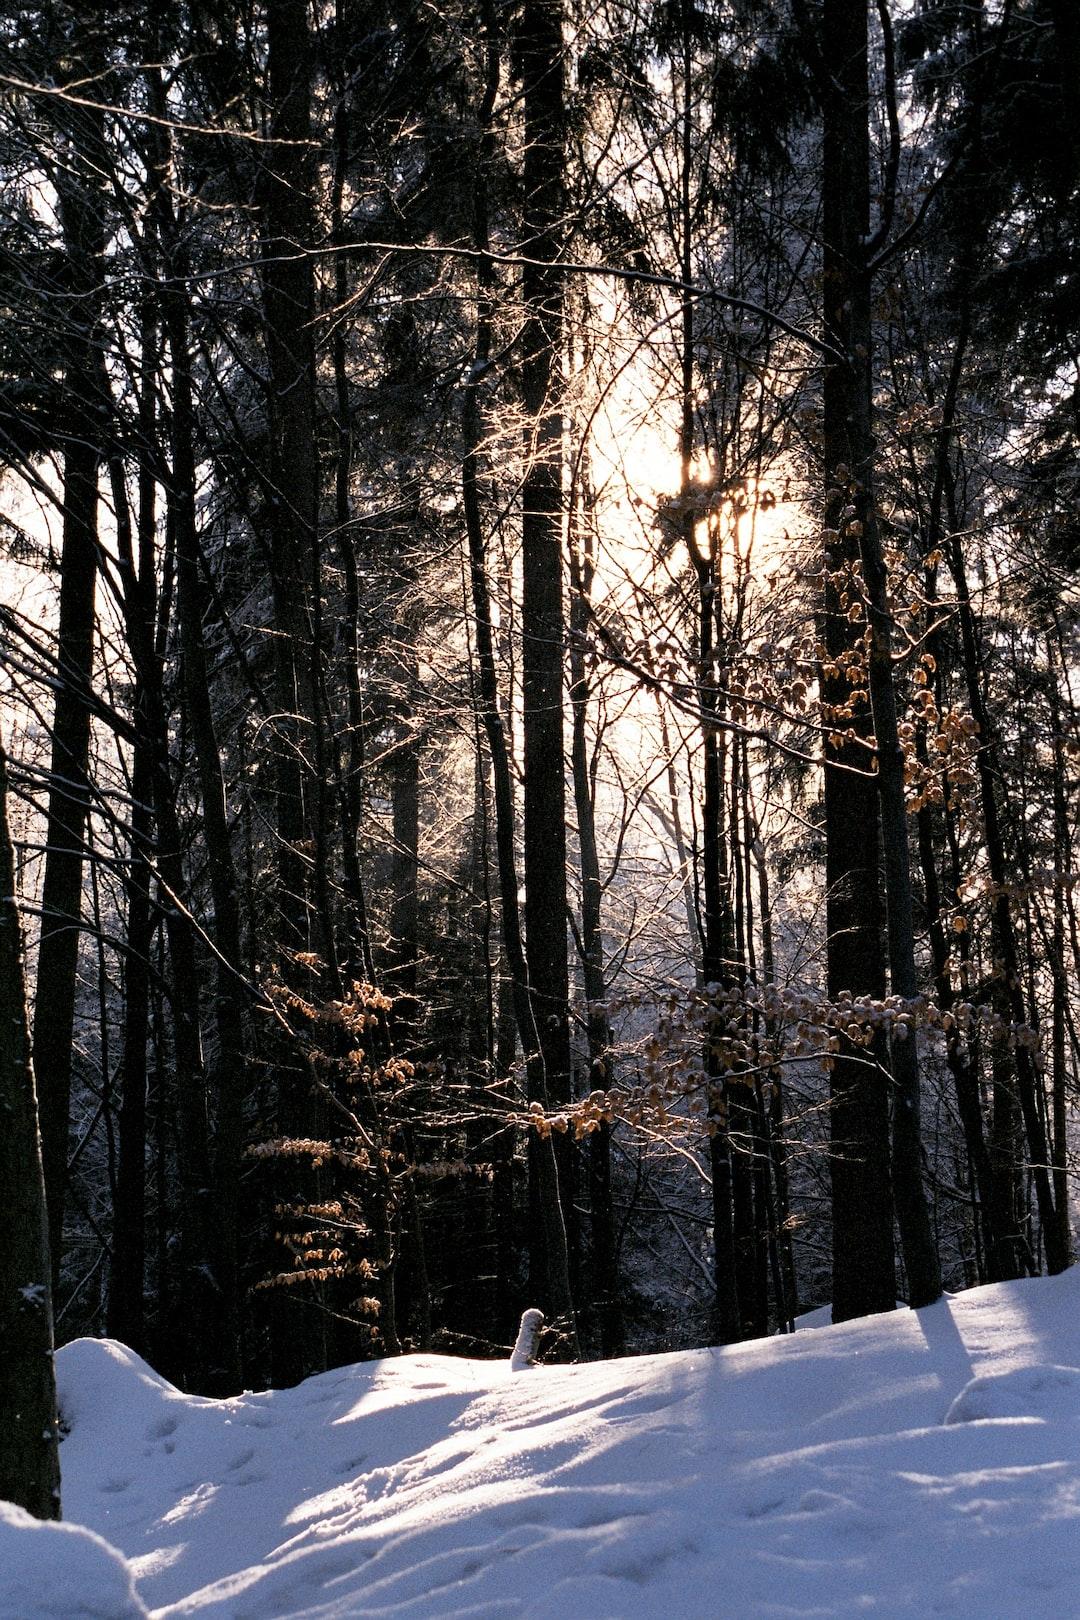 Wintery walk in the woods